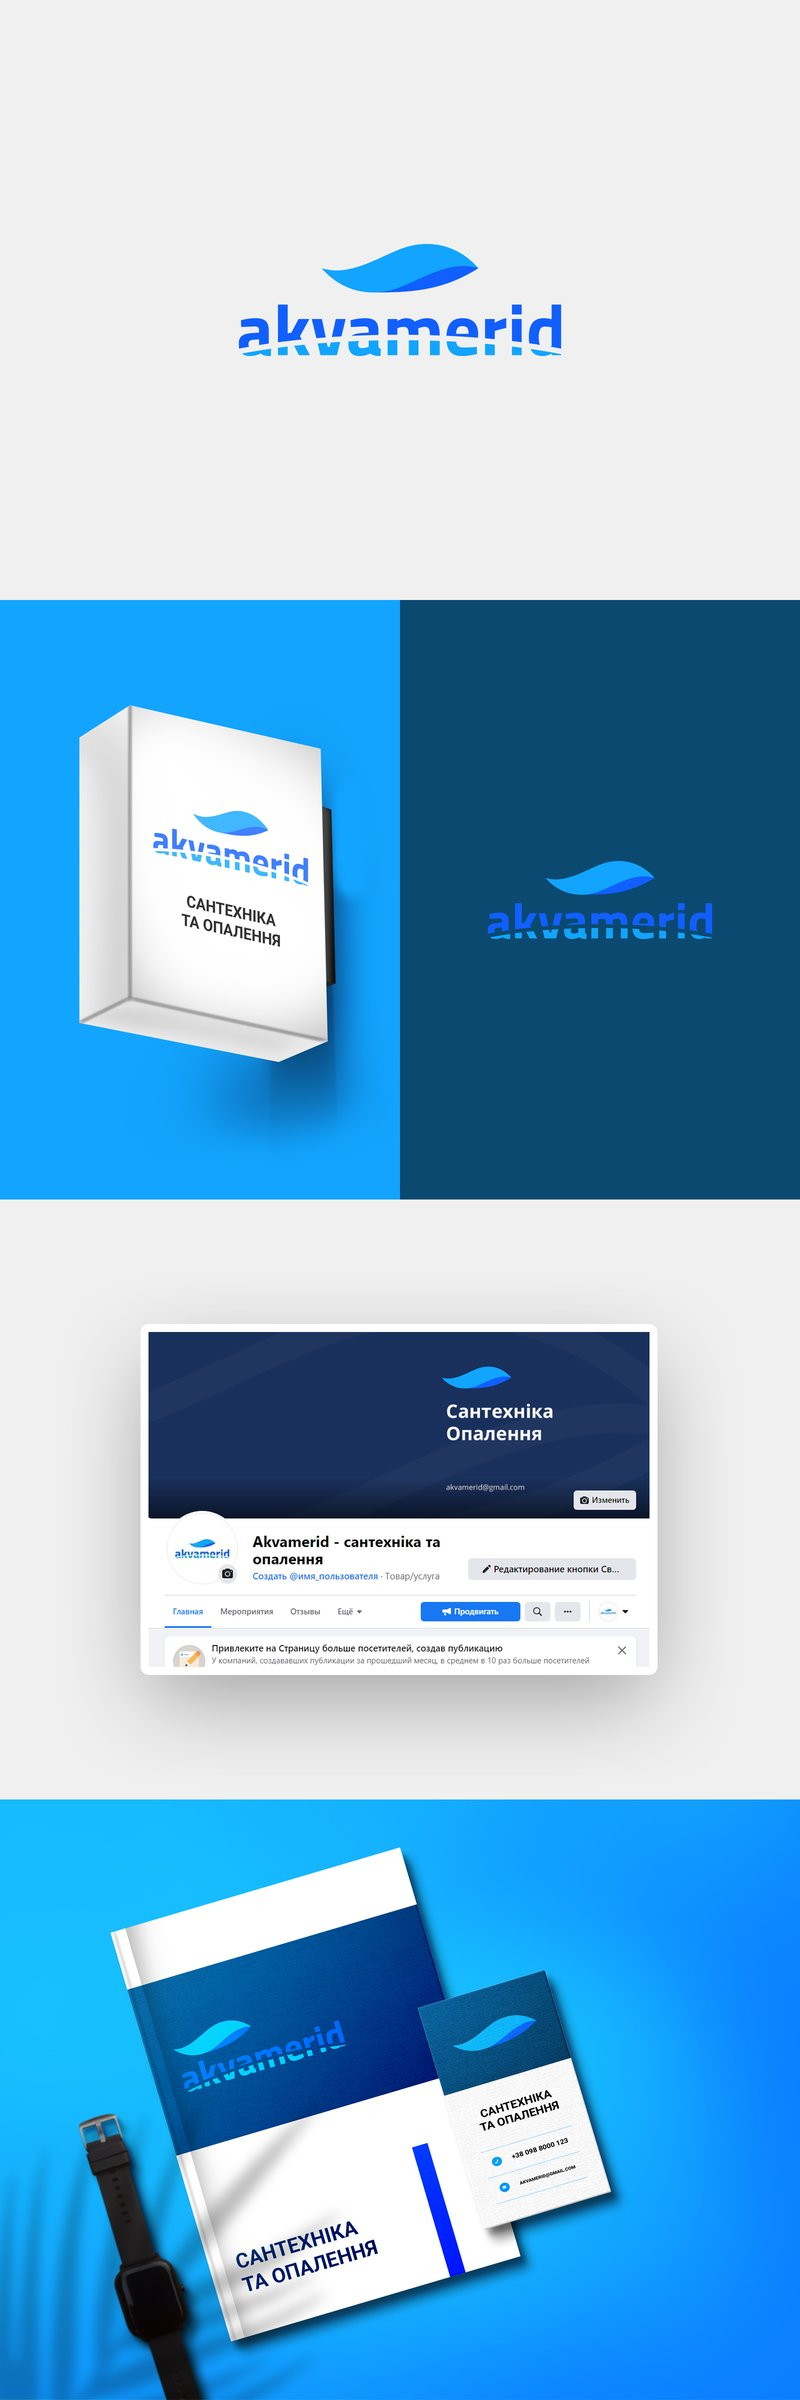 Логотип для akvamerid – работа в портфолио фрилансера